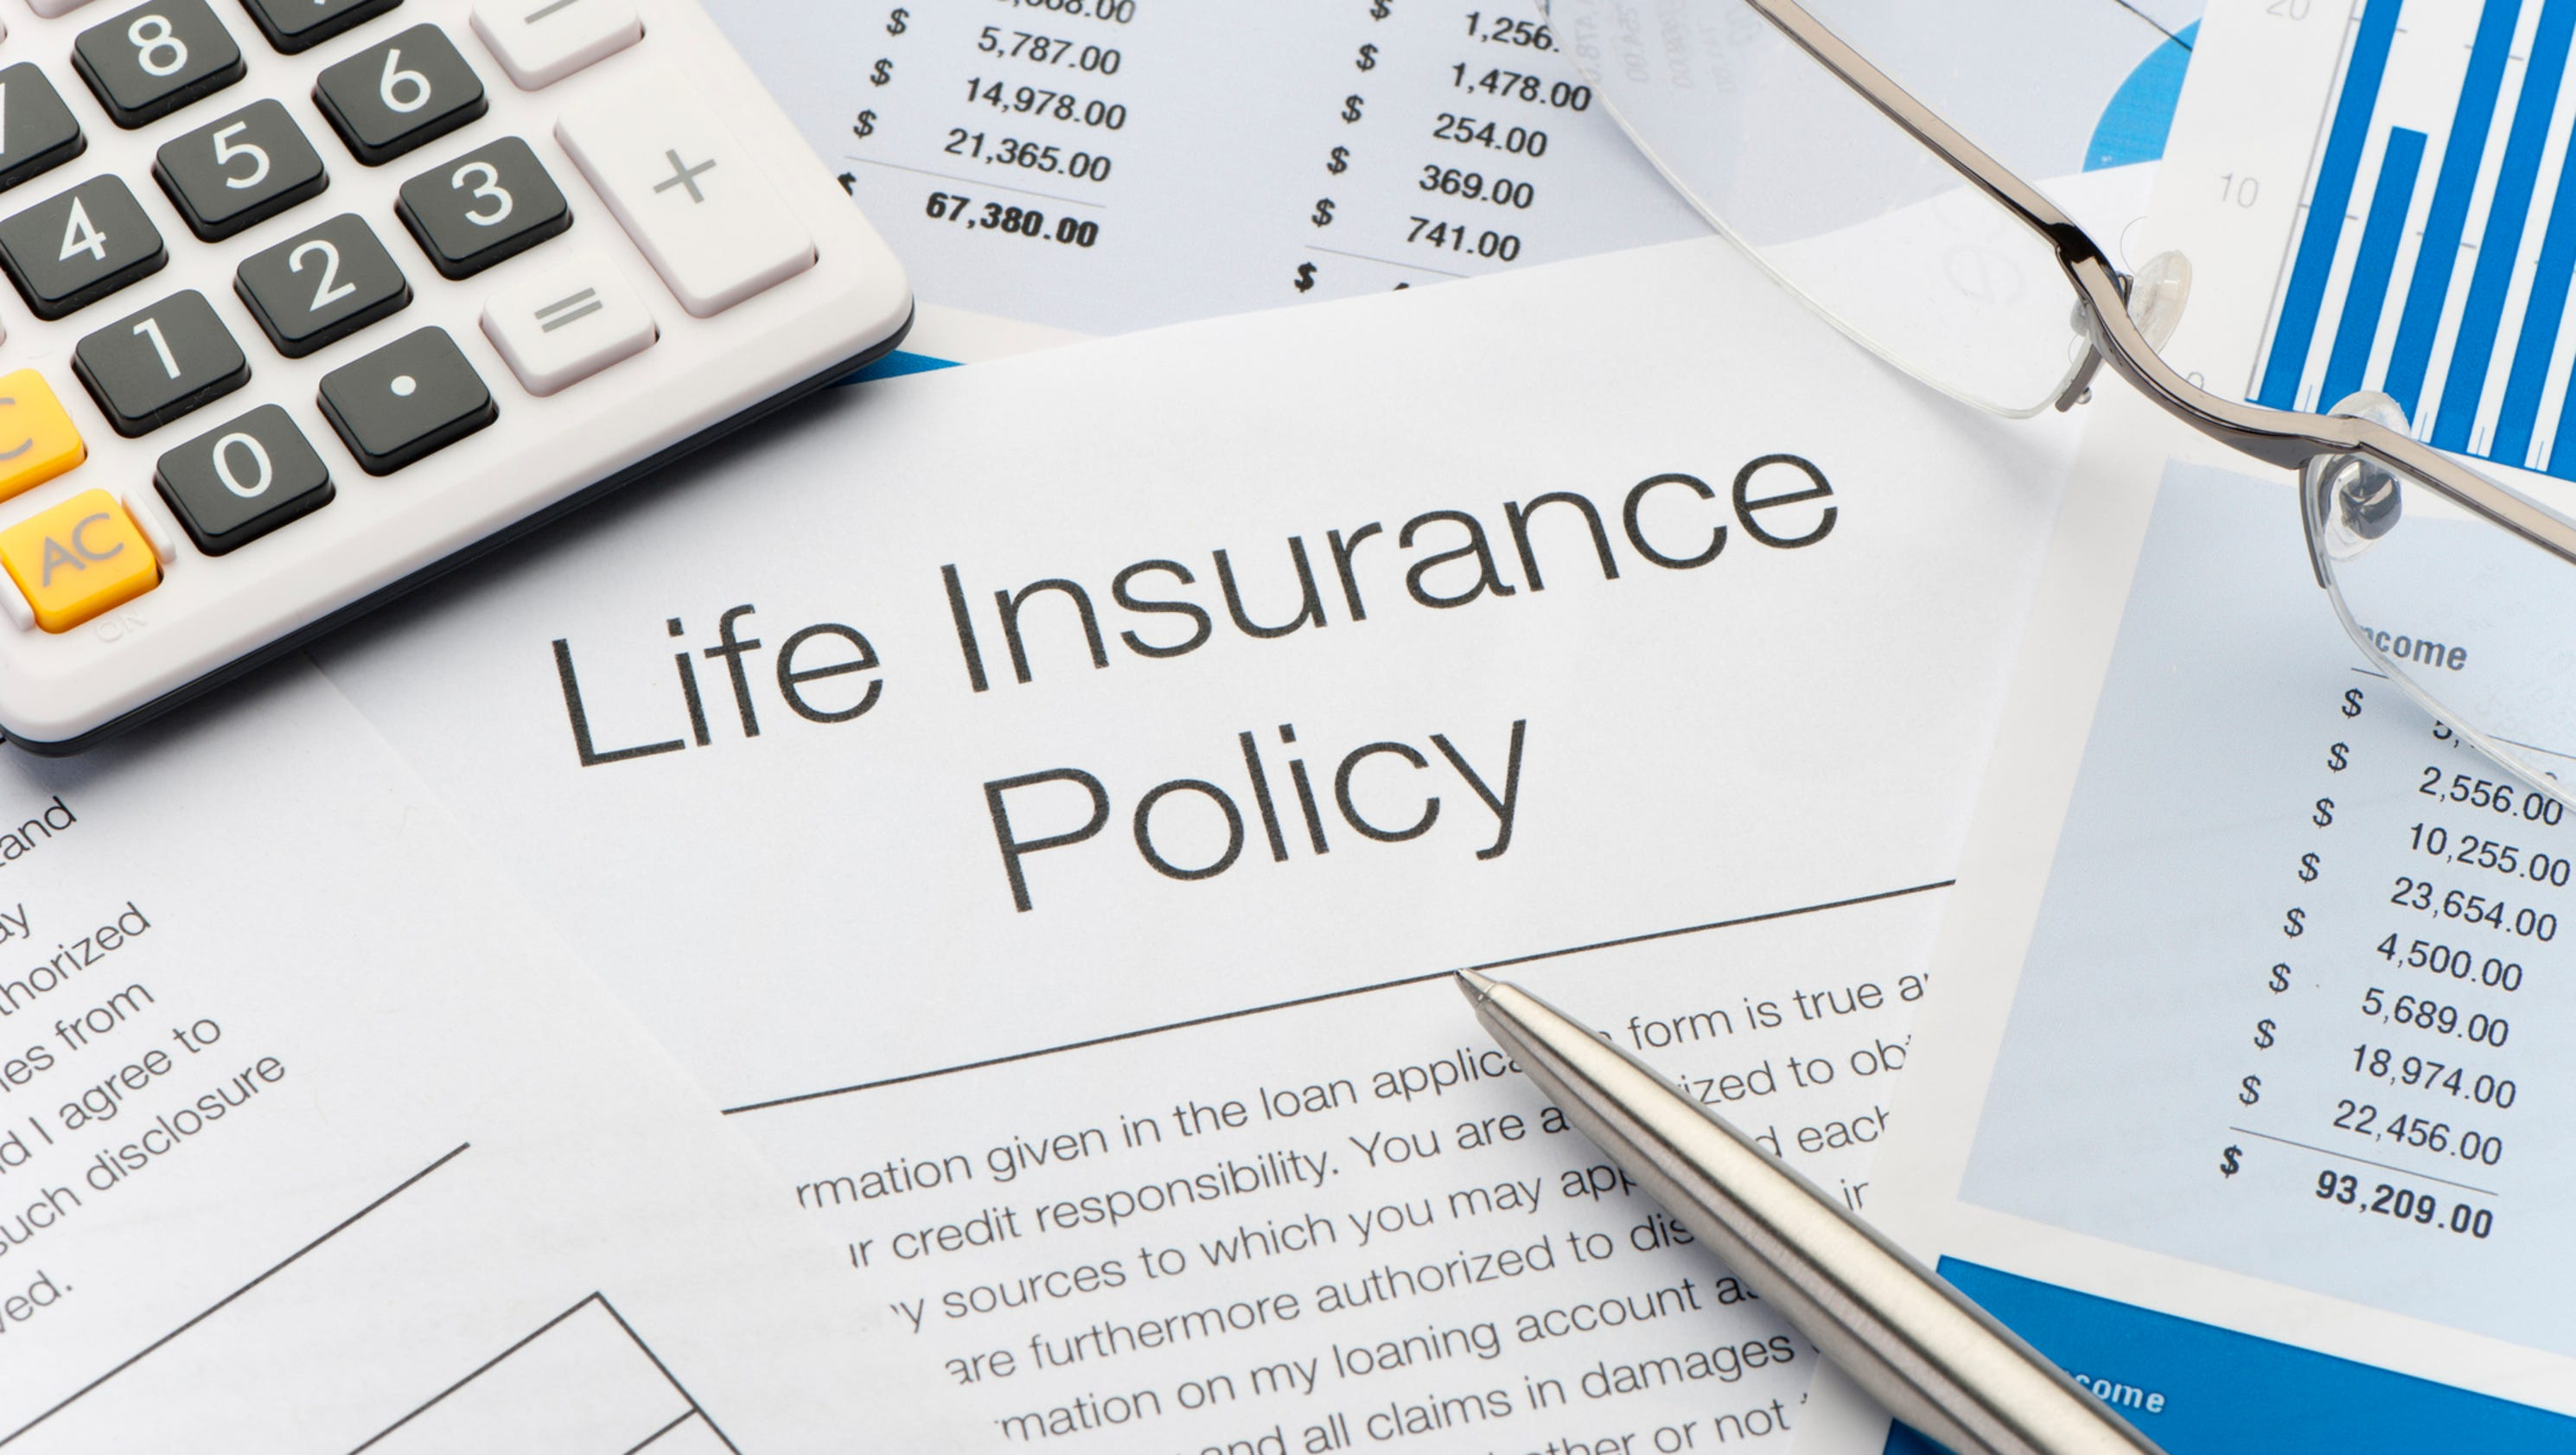 Firefly Travel Insurance